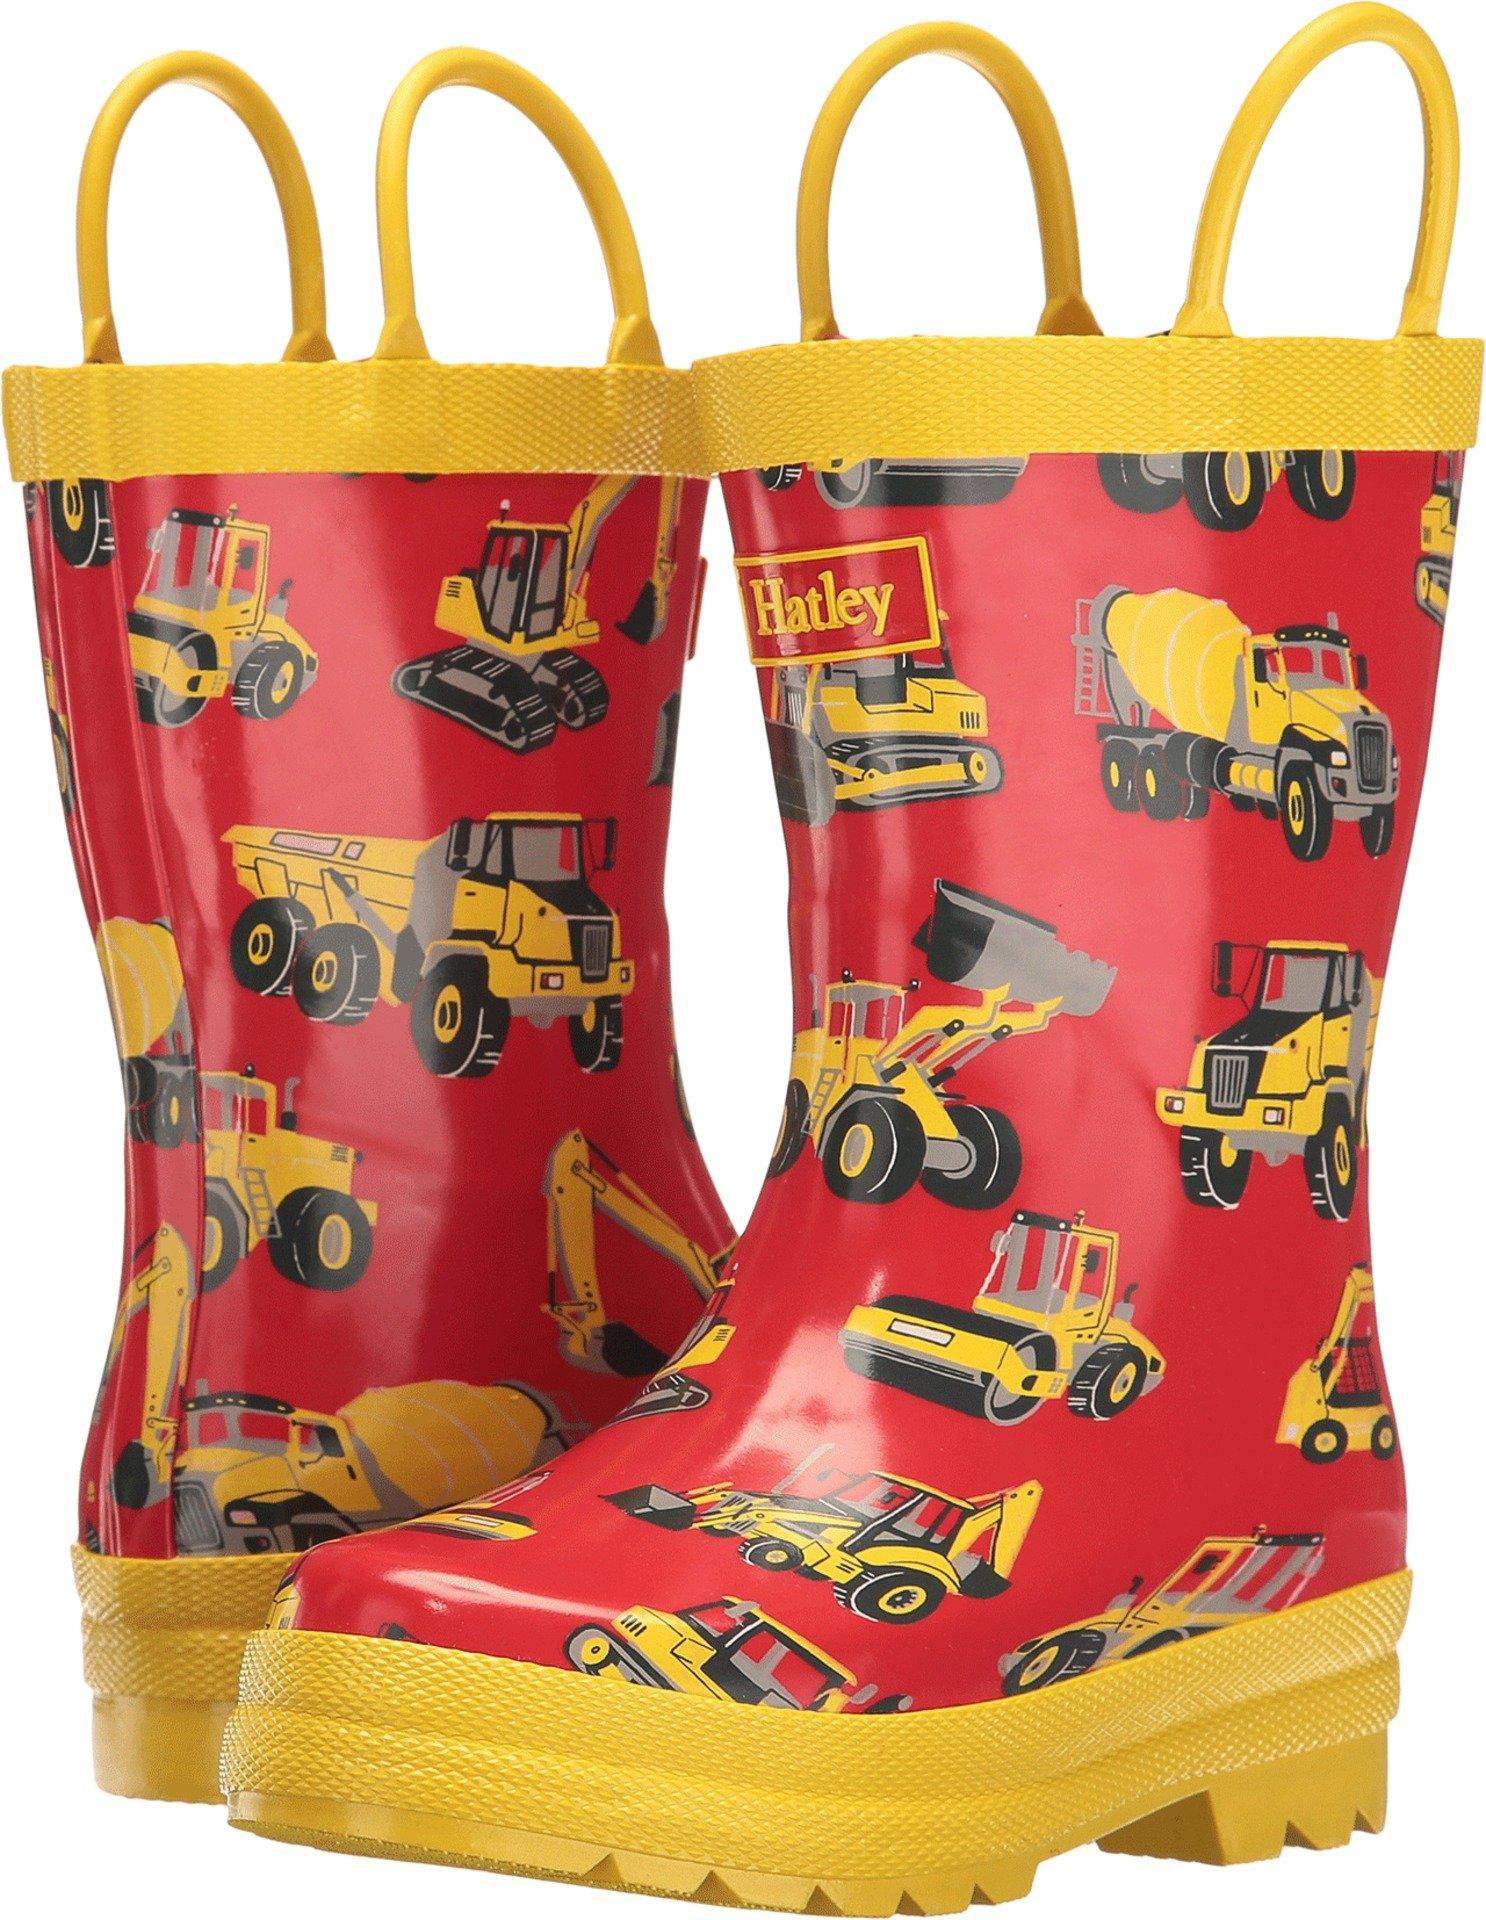 Hatley Boys' Printed Rain Boots, Heavy Duty Machines, 8 M US Little Kid